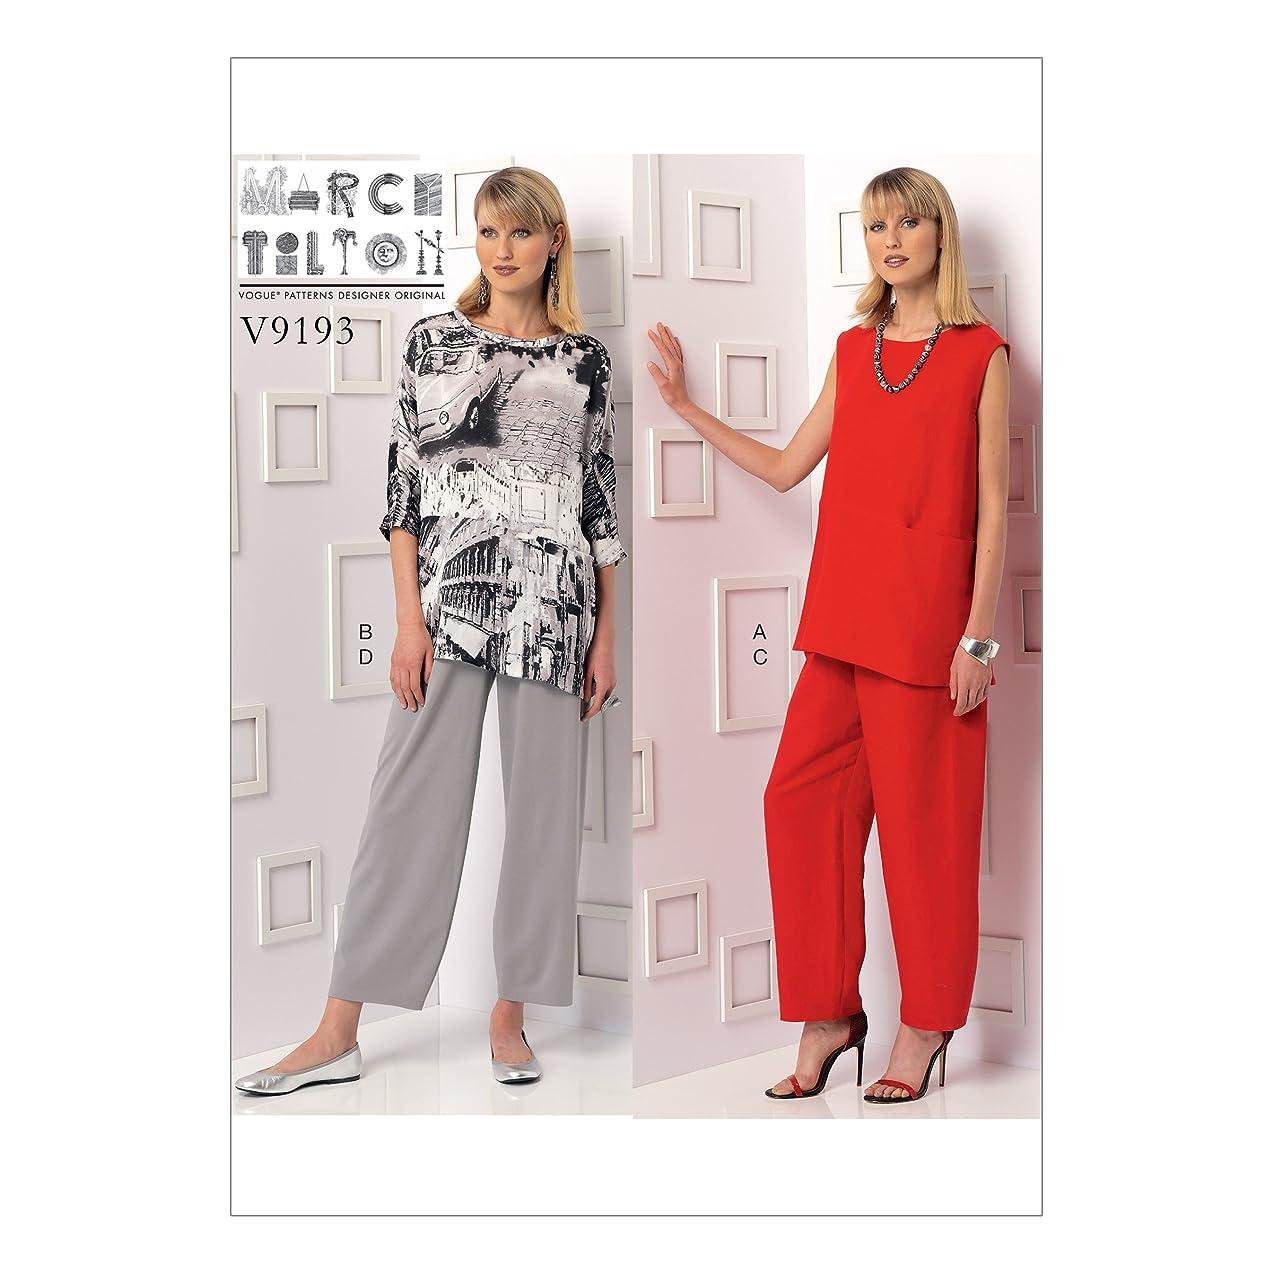 Vogue Patterns V9193F50 Misses' Sleeveless Or Dolman Sleeve Tunics Pants with Yoke, 16-18-20-22-24, Green